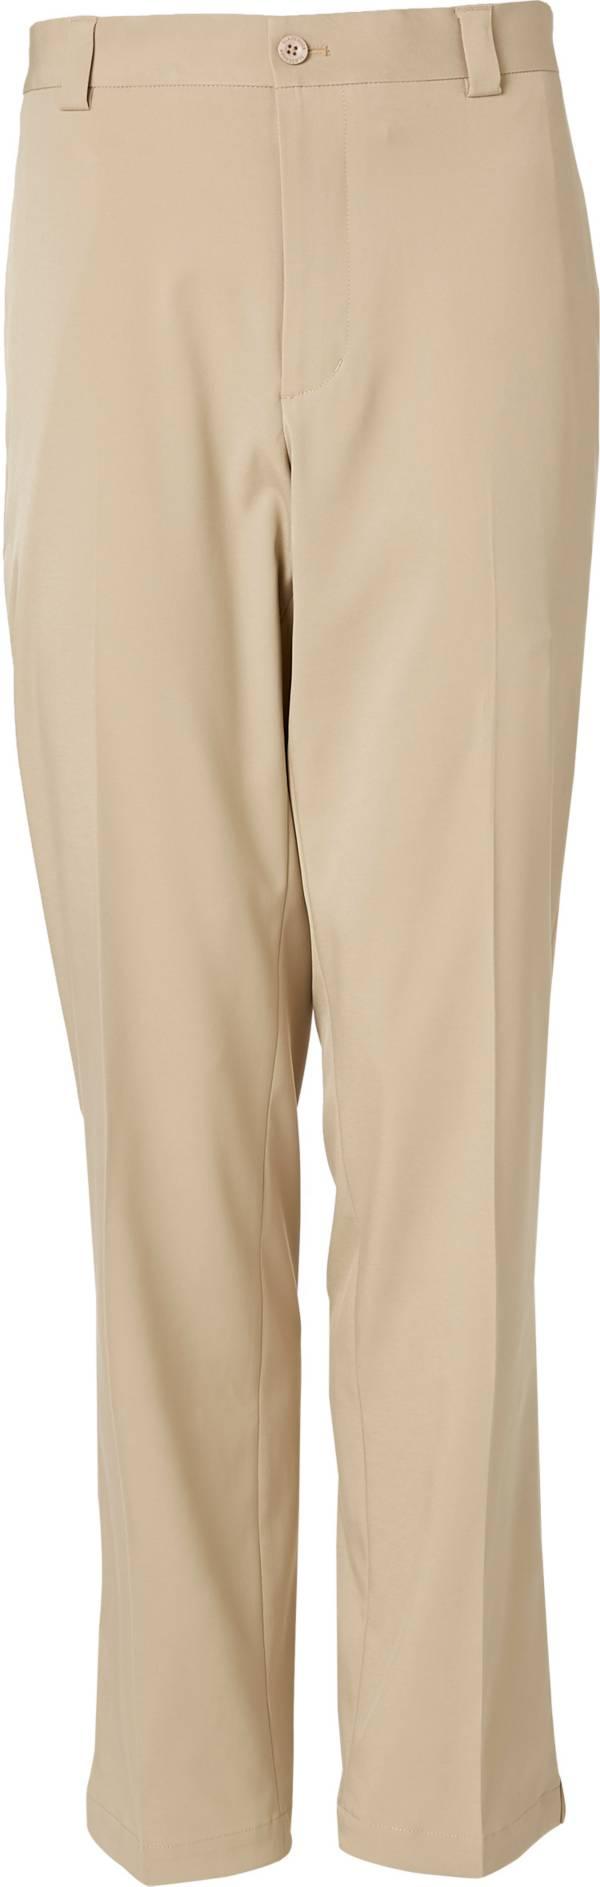 Slazenger Men's Tech Flat Front Golf Pants product image